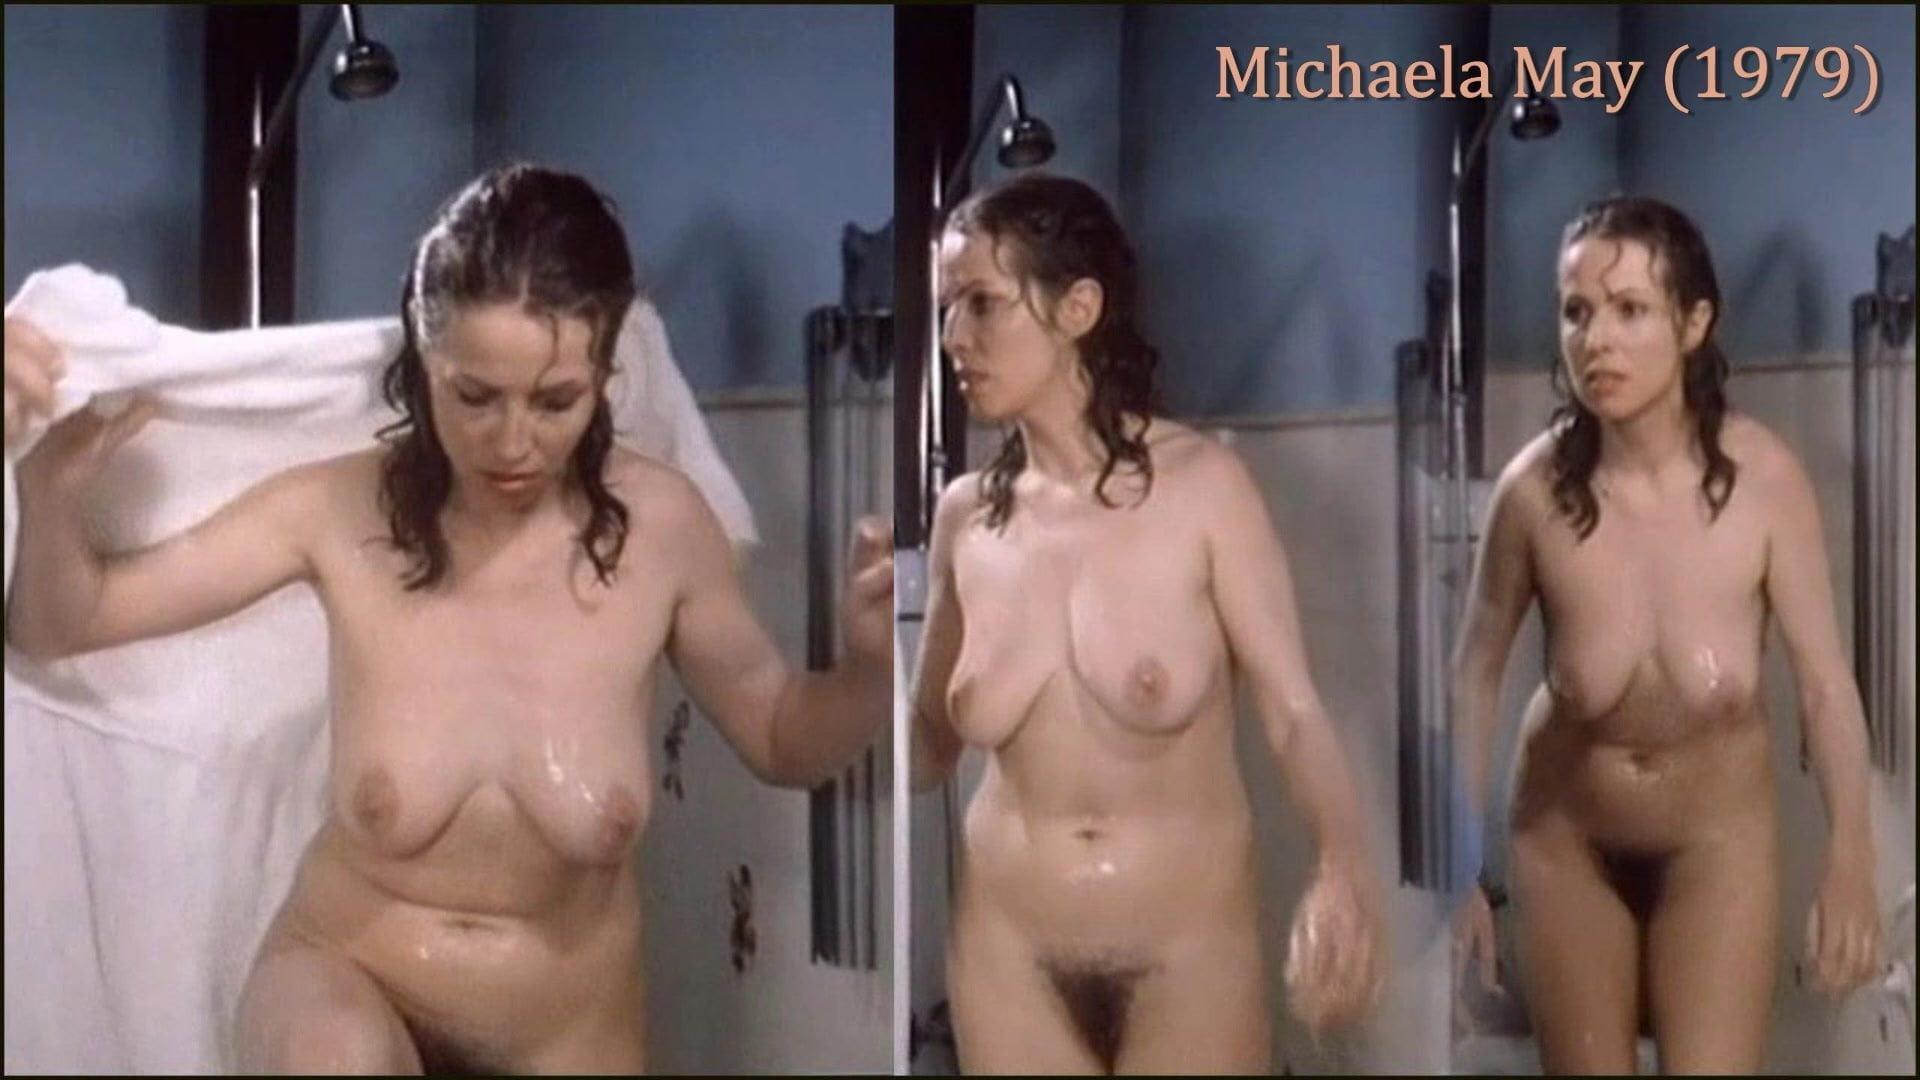 May nackt Michaela  Michaela May